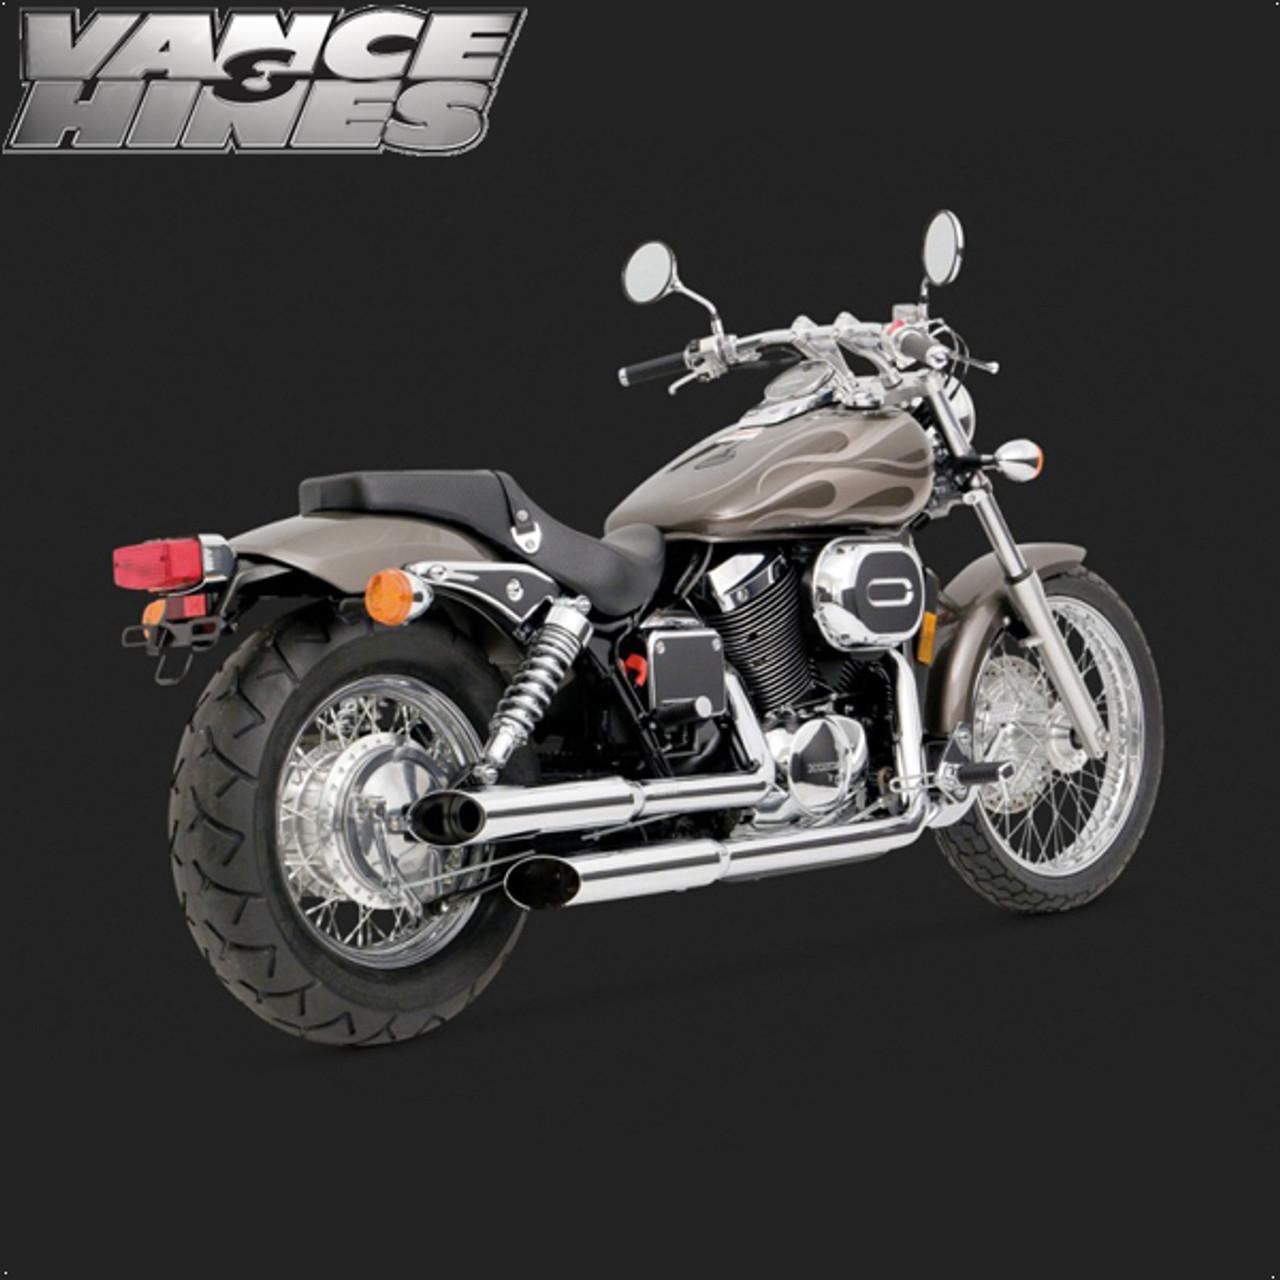 vance hines cruzer full exhaust system honda shadow spirit 750 dc 01 07